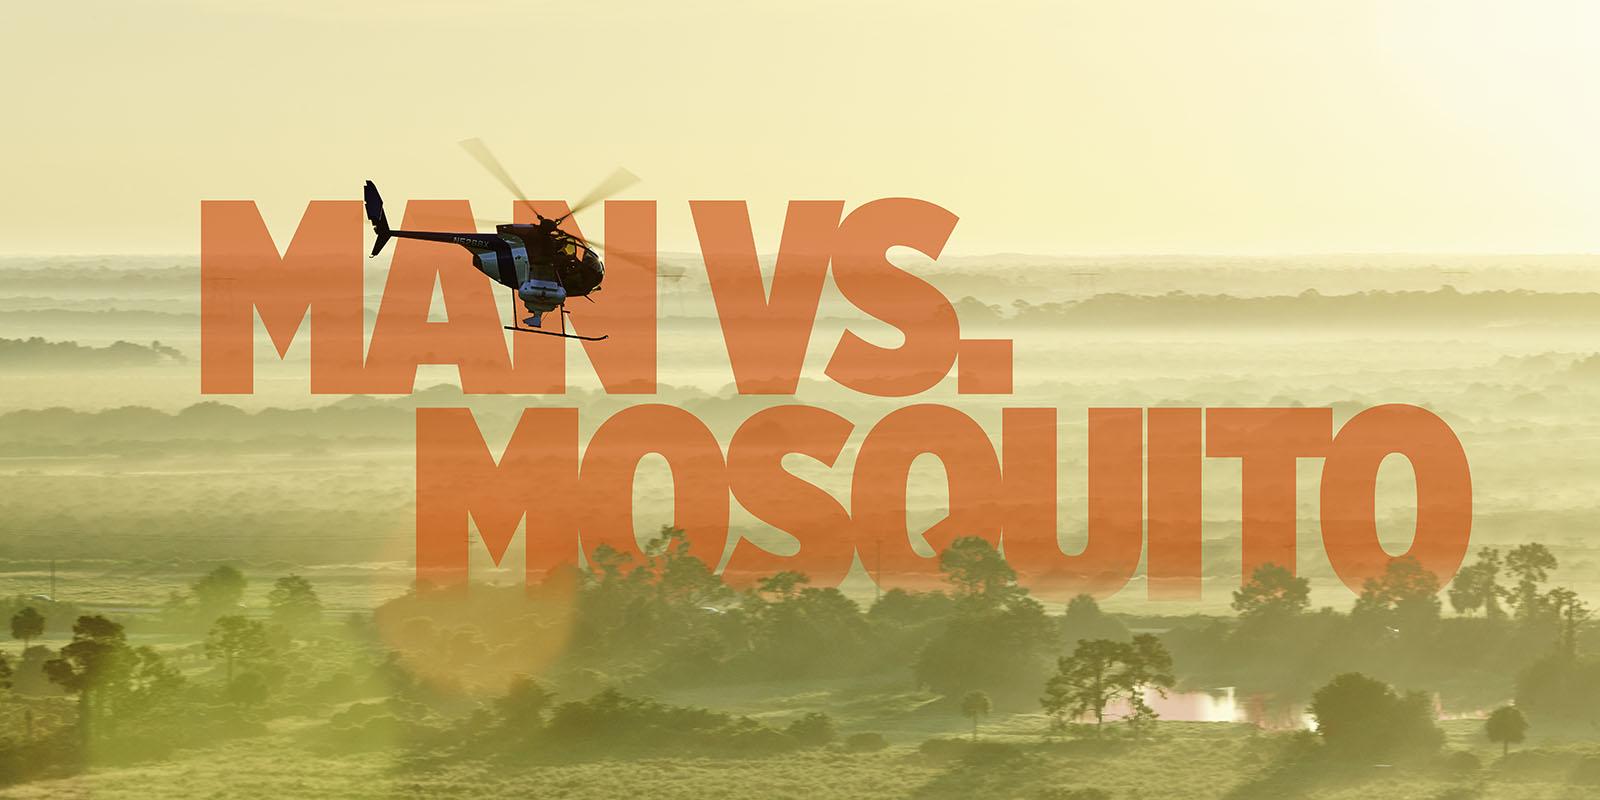 Man vs. Mosquito